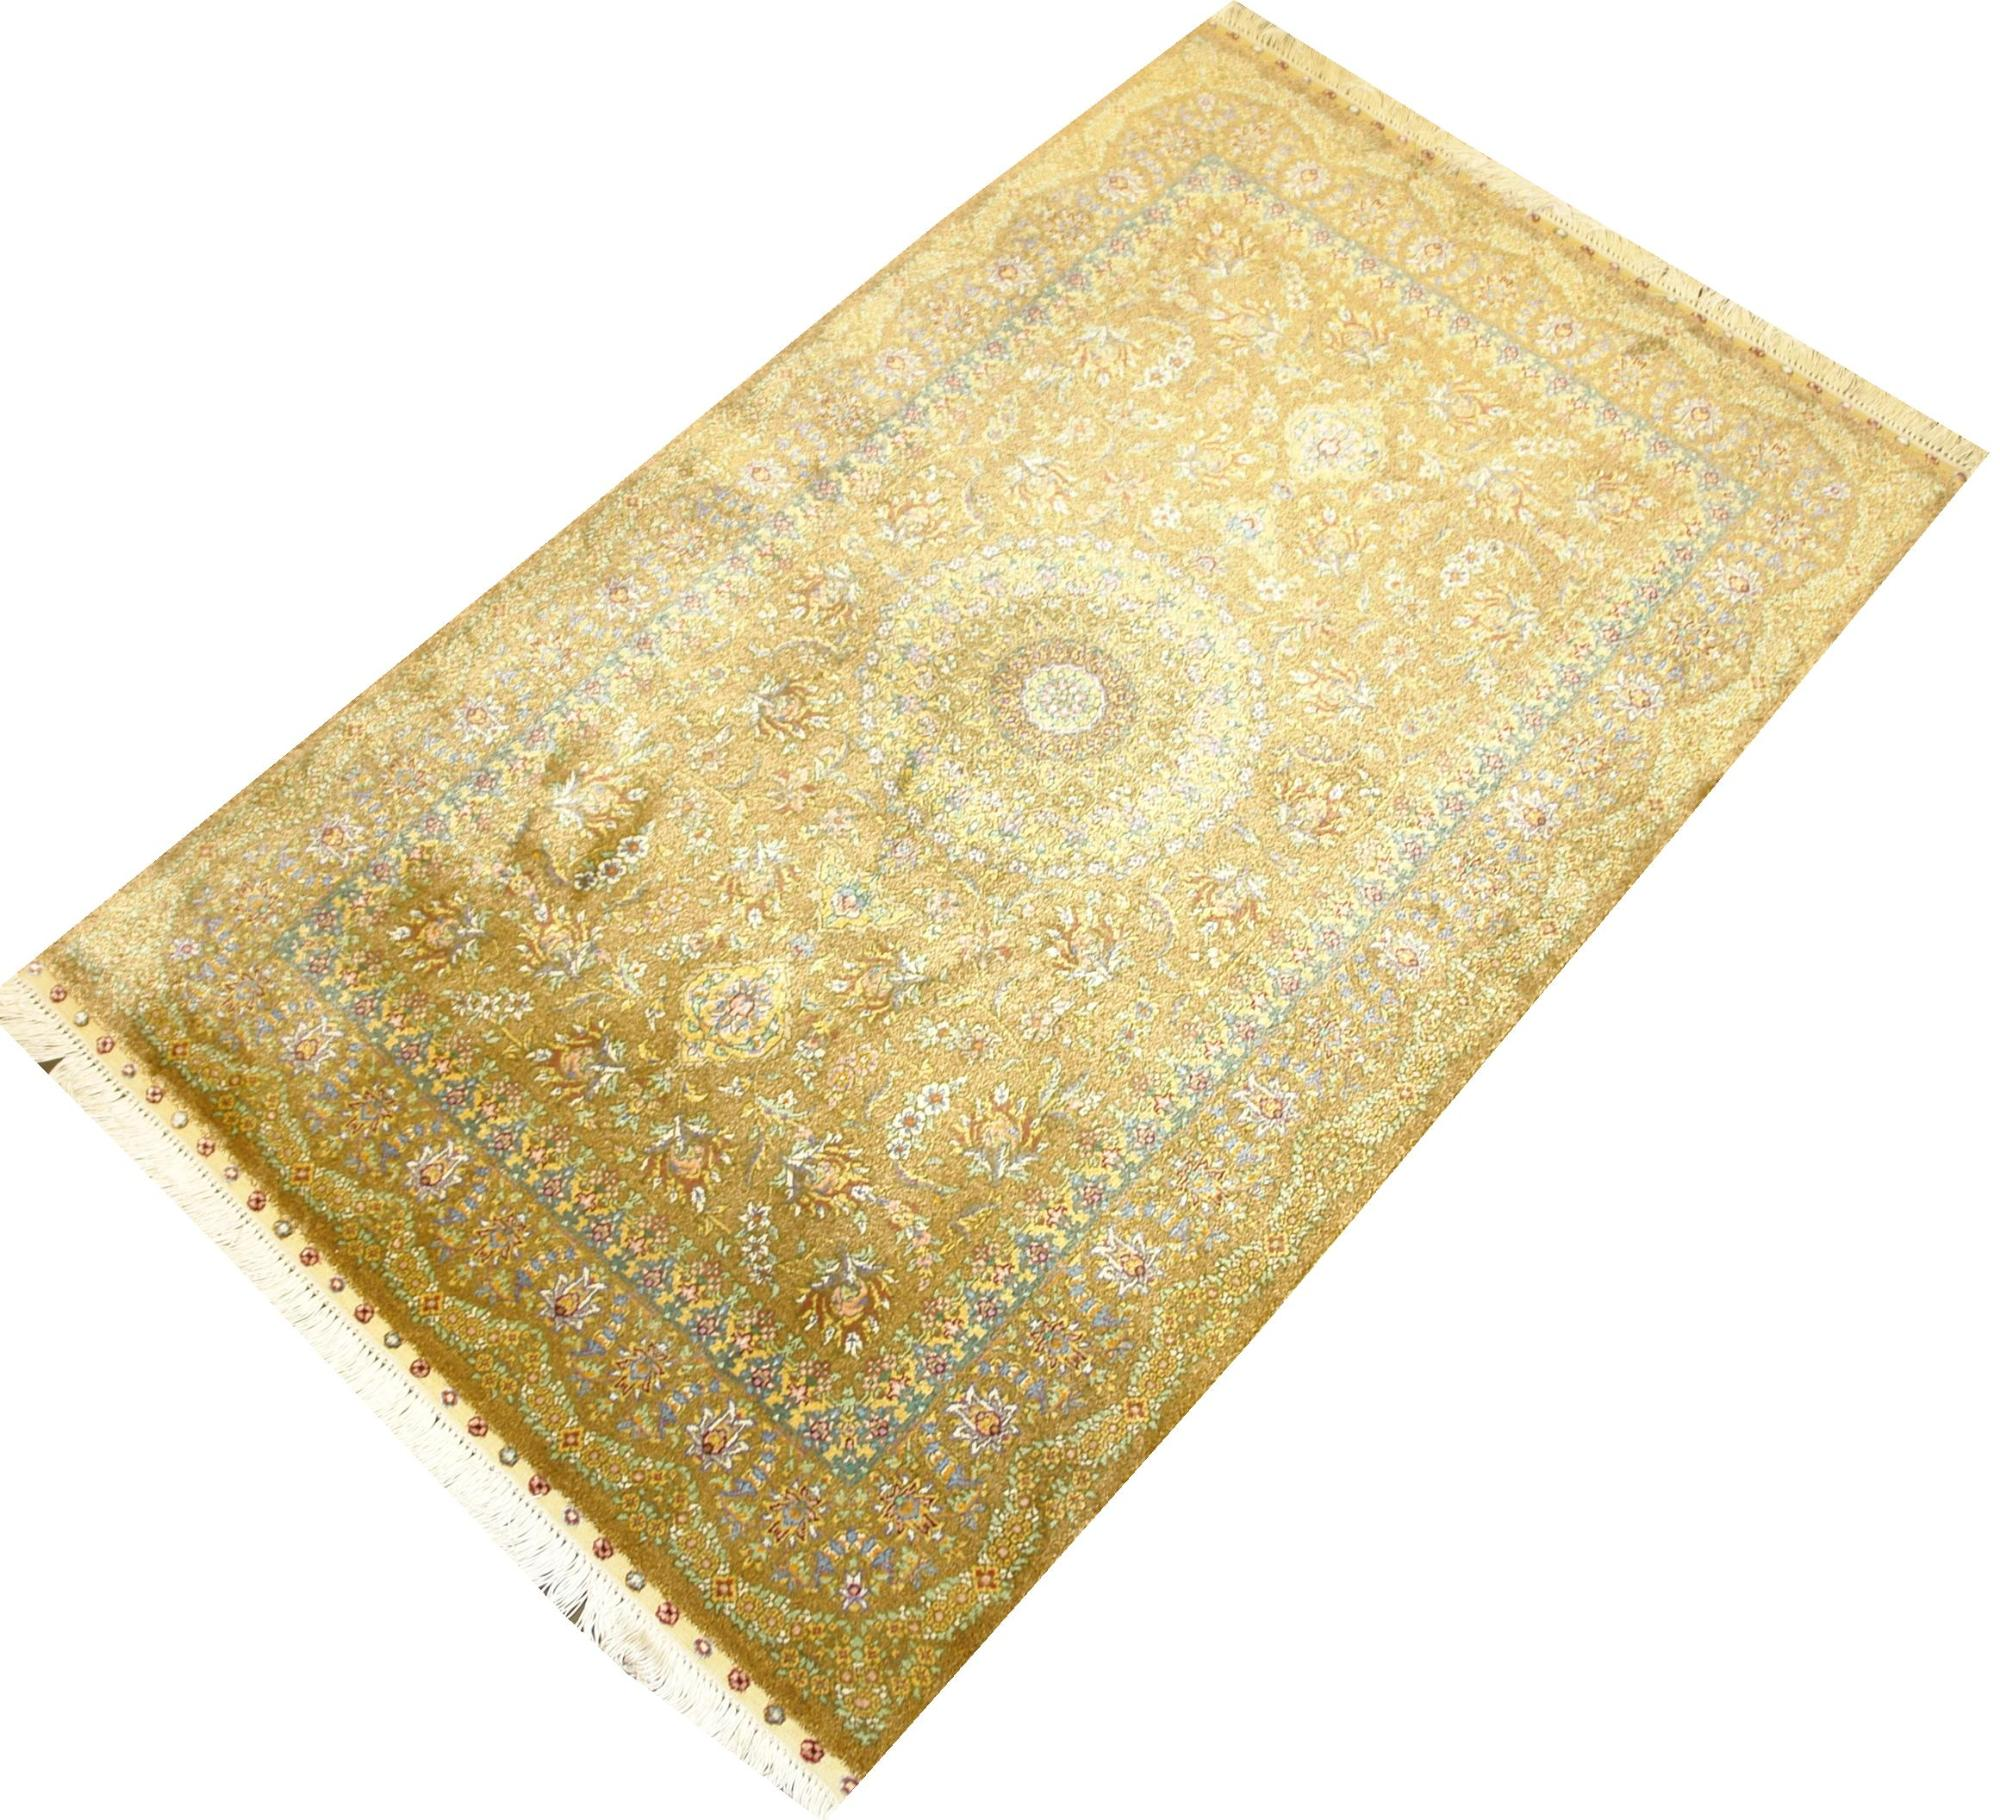 Турецкий ковер из шелка Медальон ОГ19SS